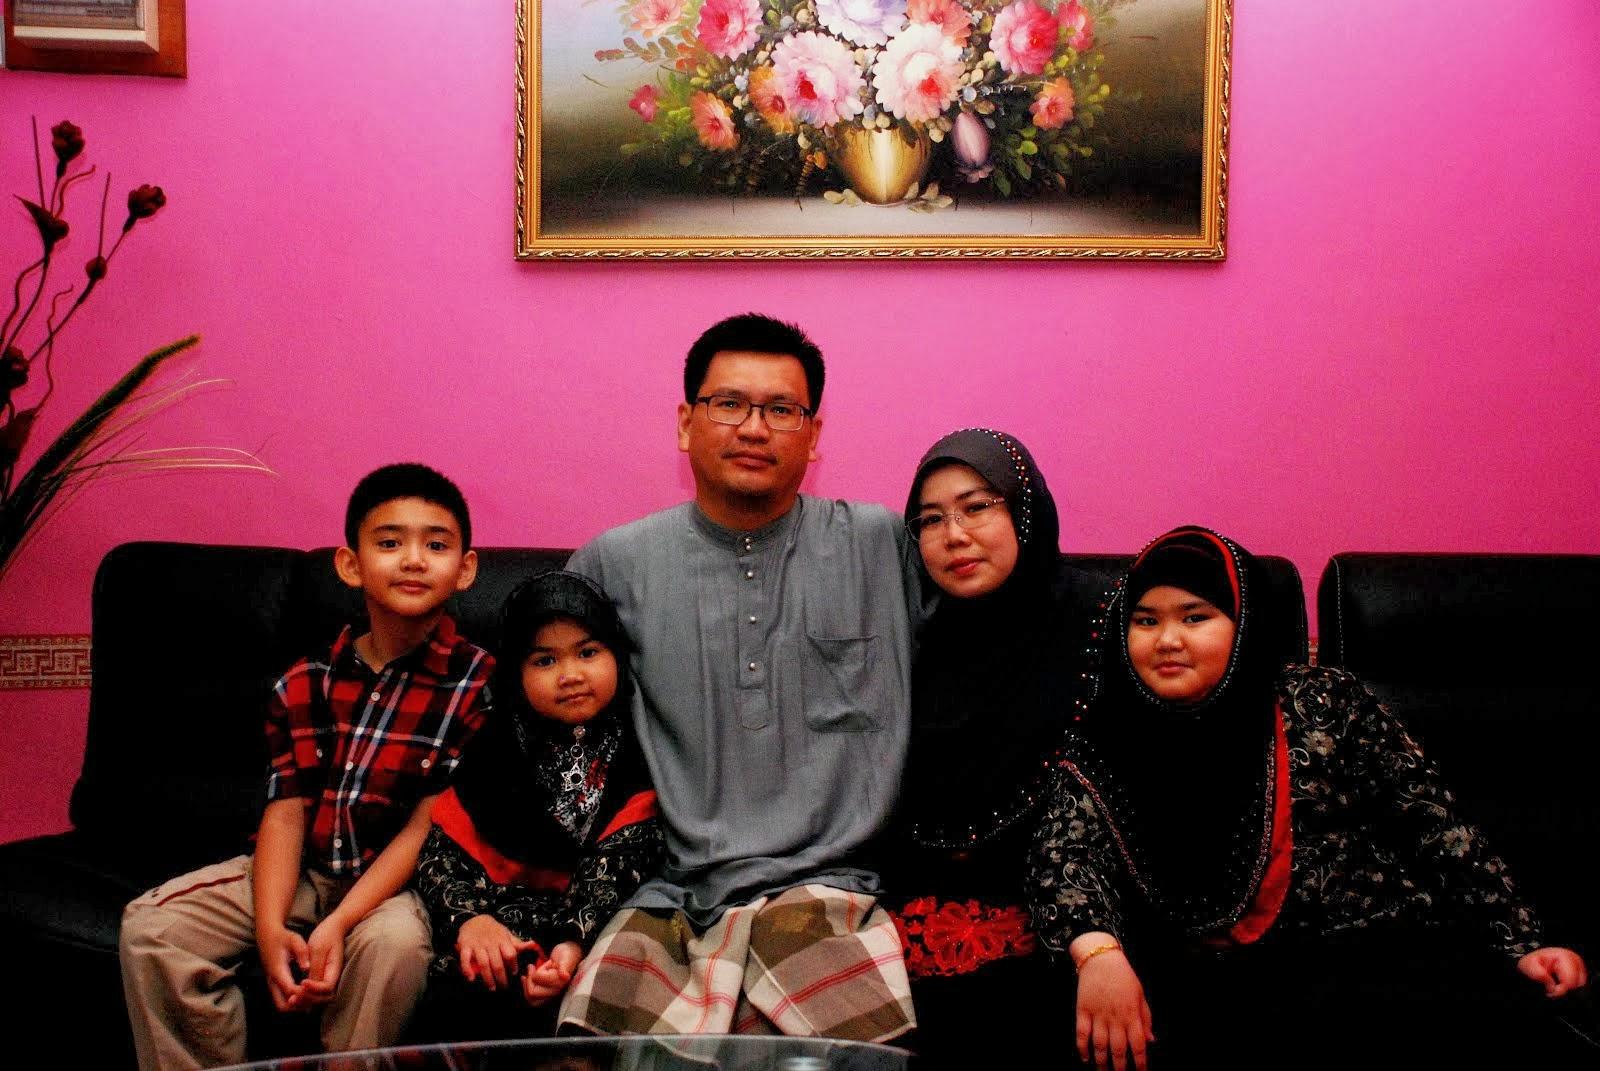 My Family 2013